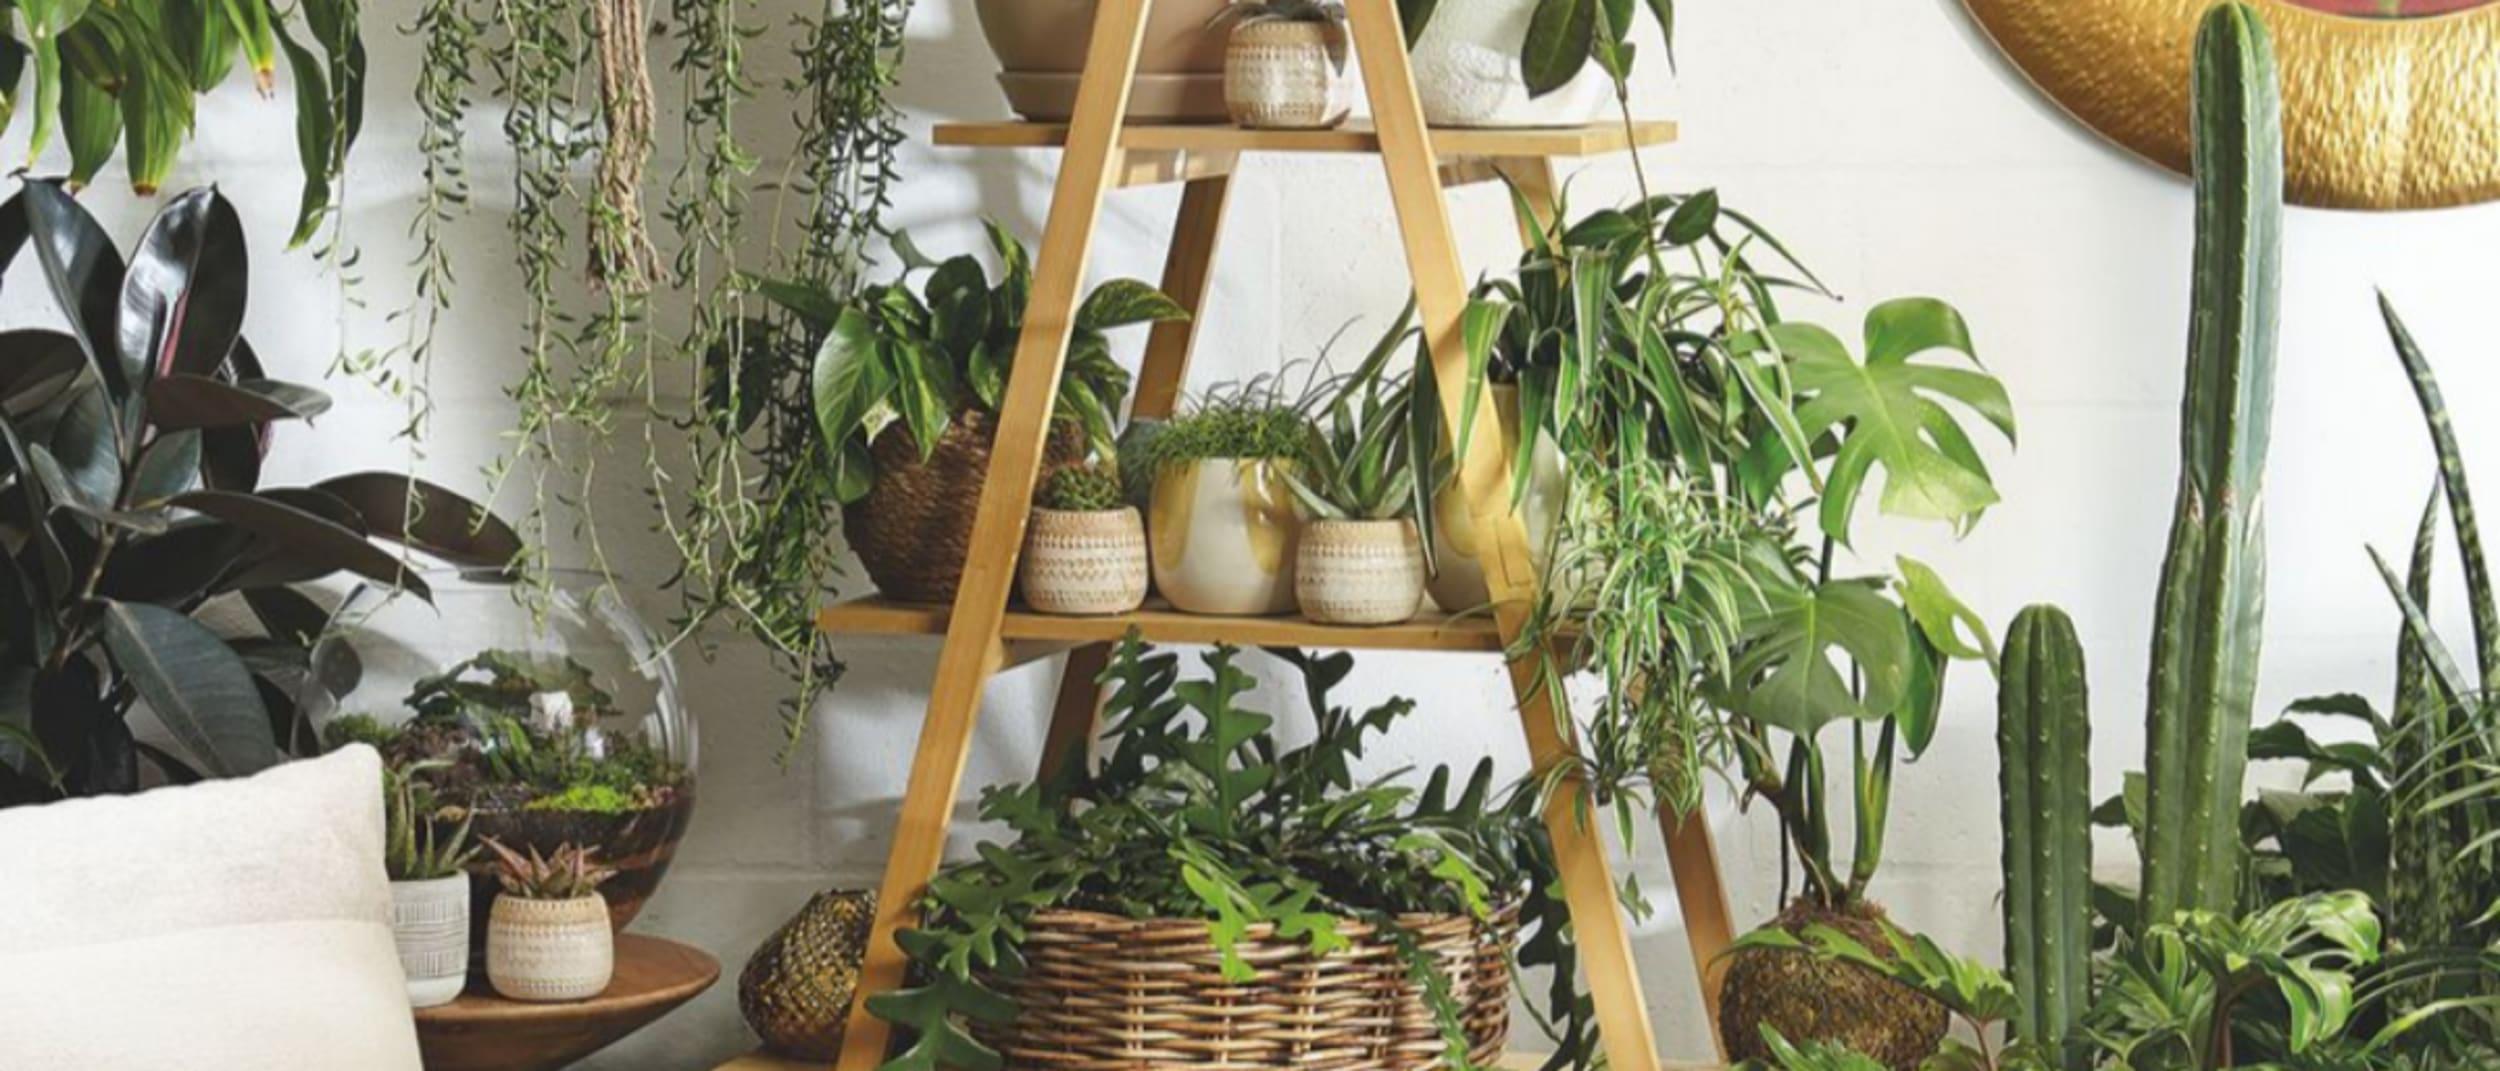 Gro Urban Oasis: Live the lush plant life at Gro